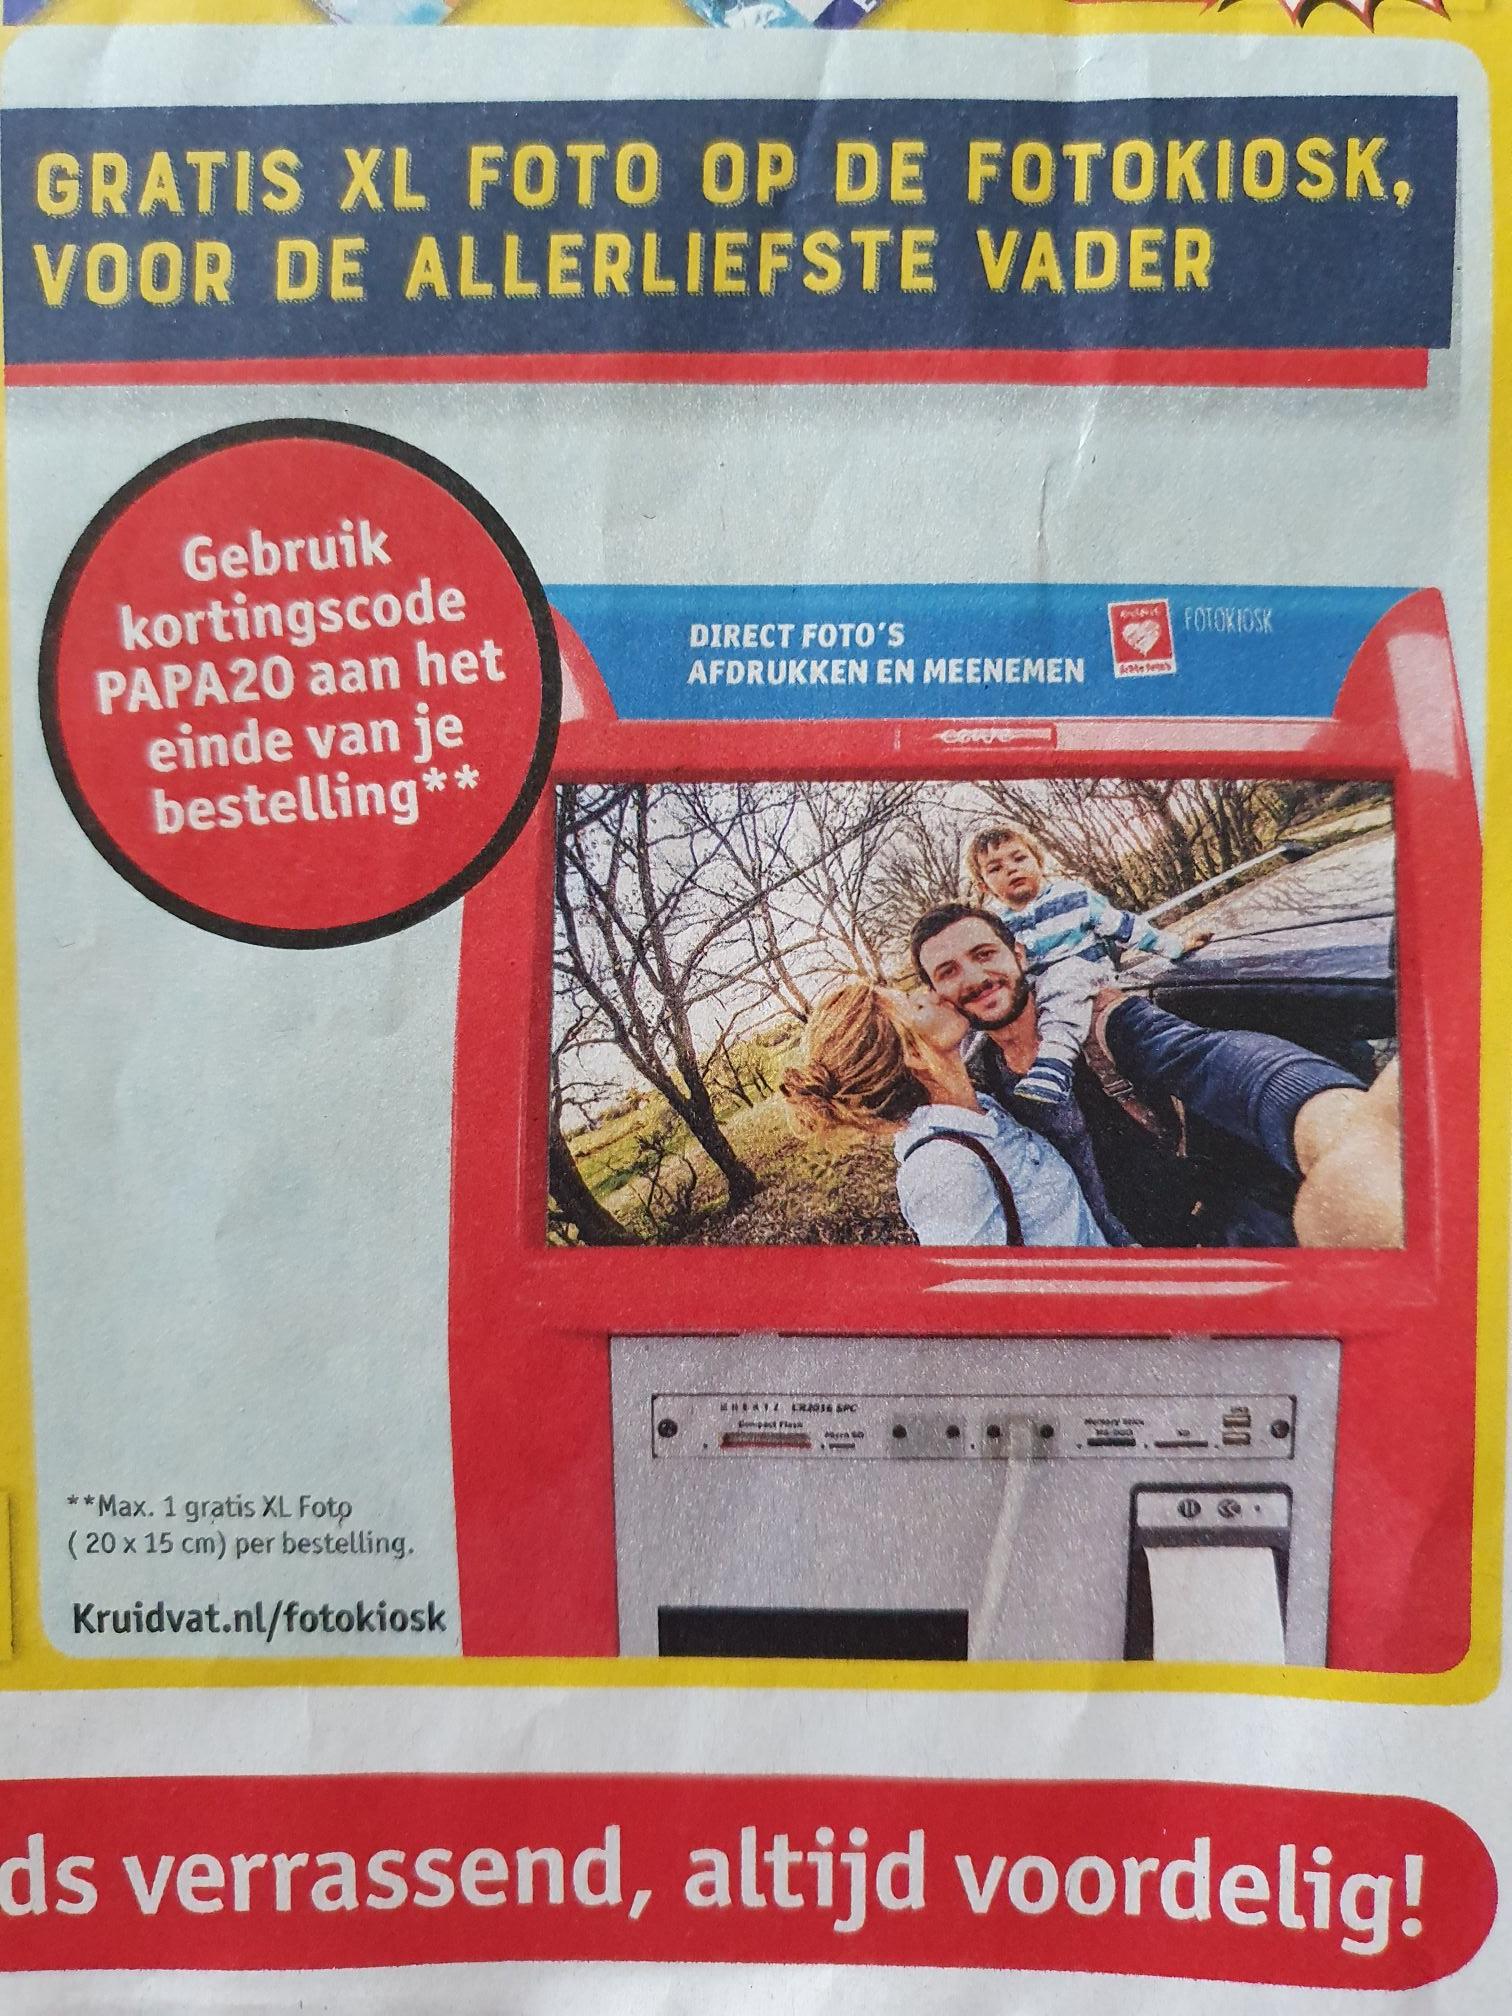 Gratis XL foto (20x15 cm) voor vaderdag @ Kruidvat (NL)